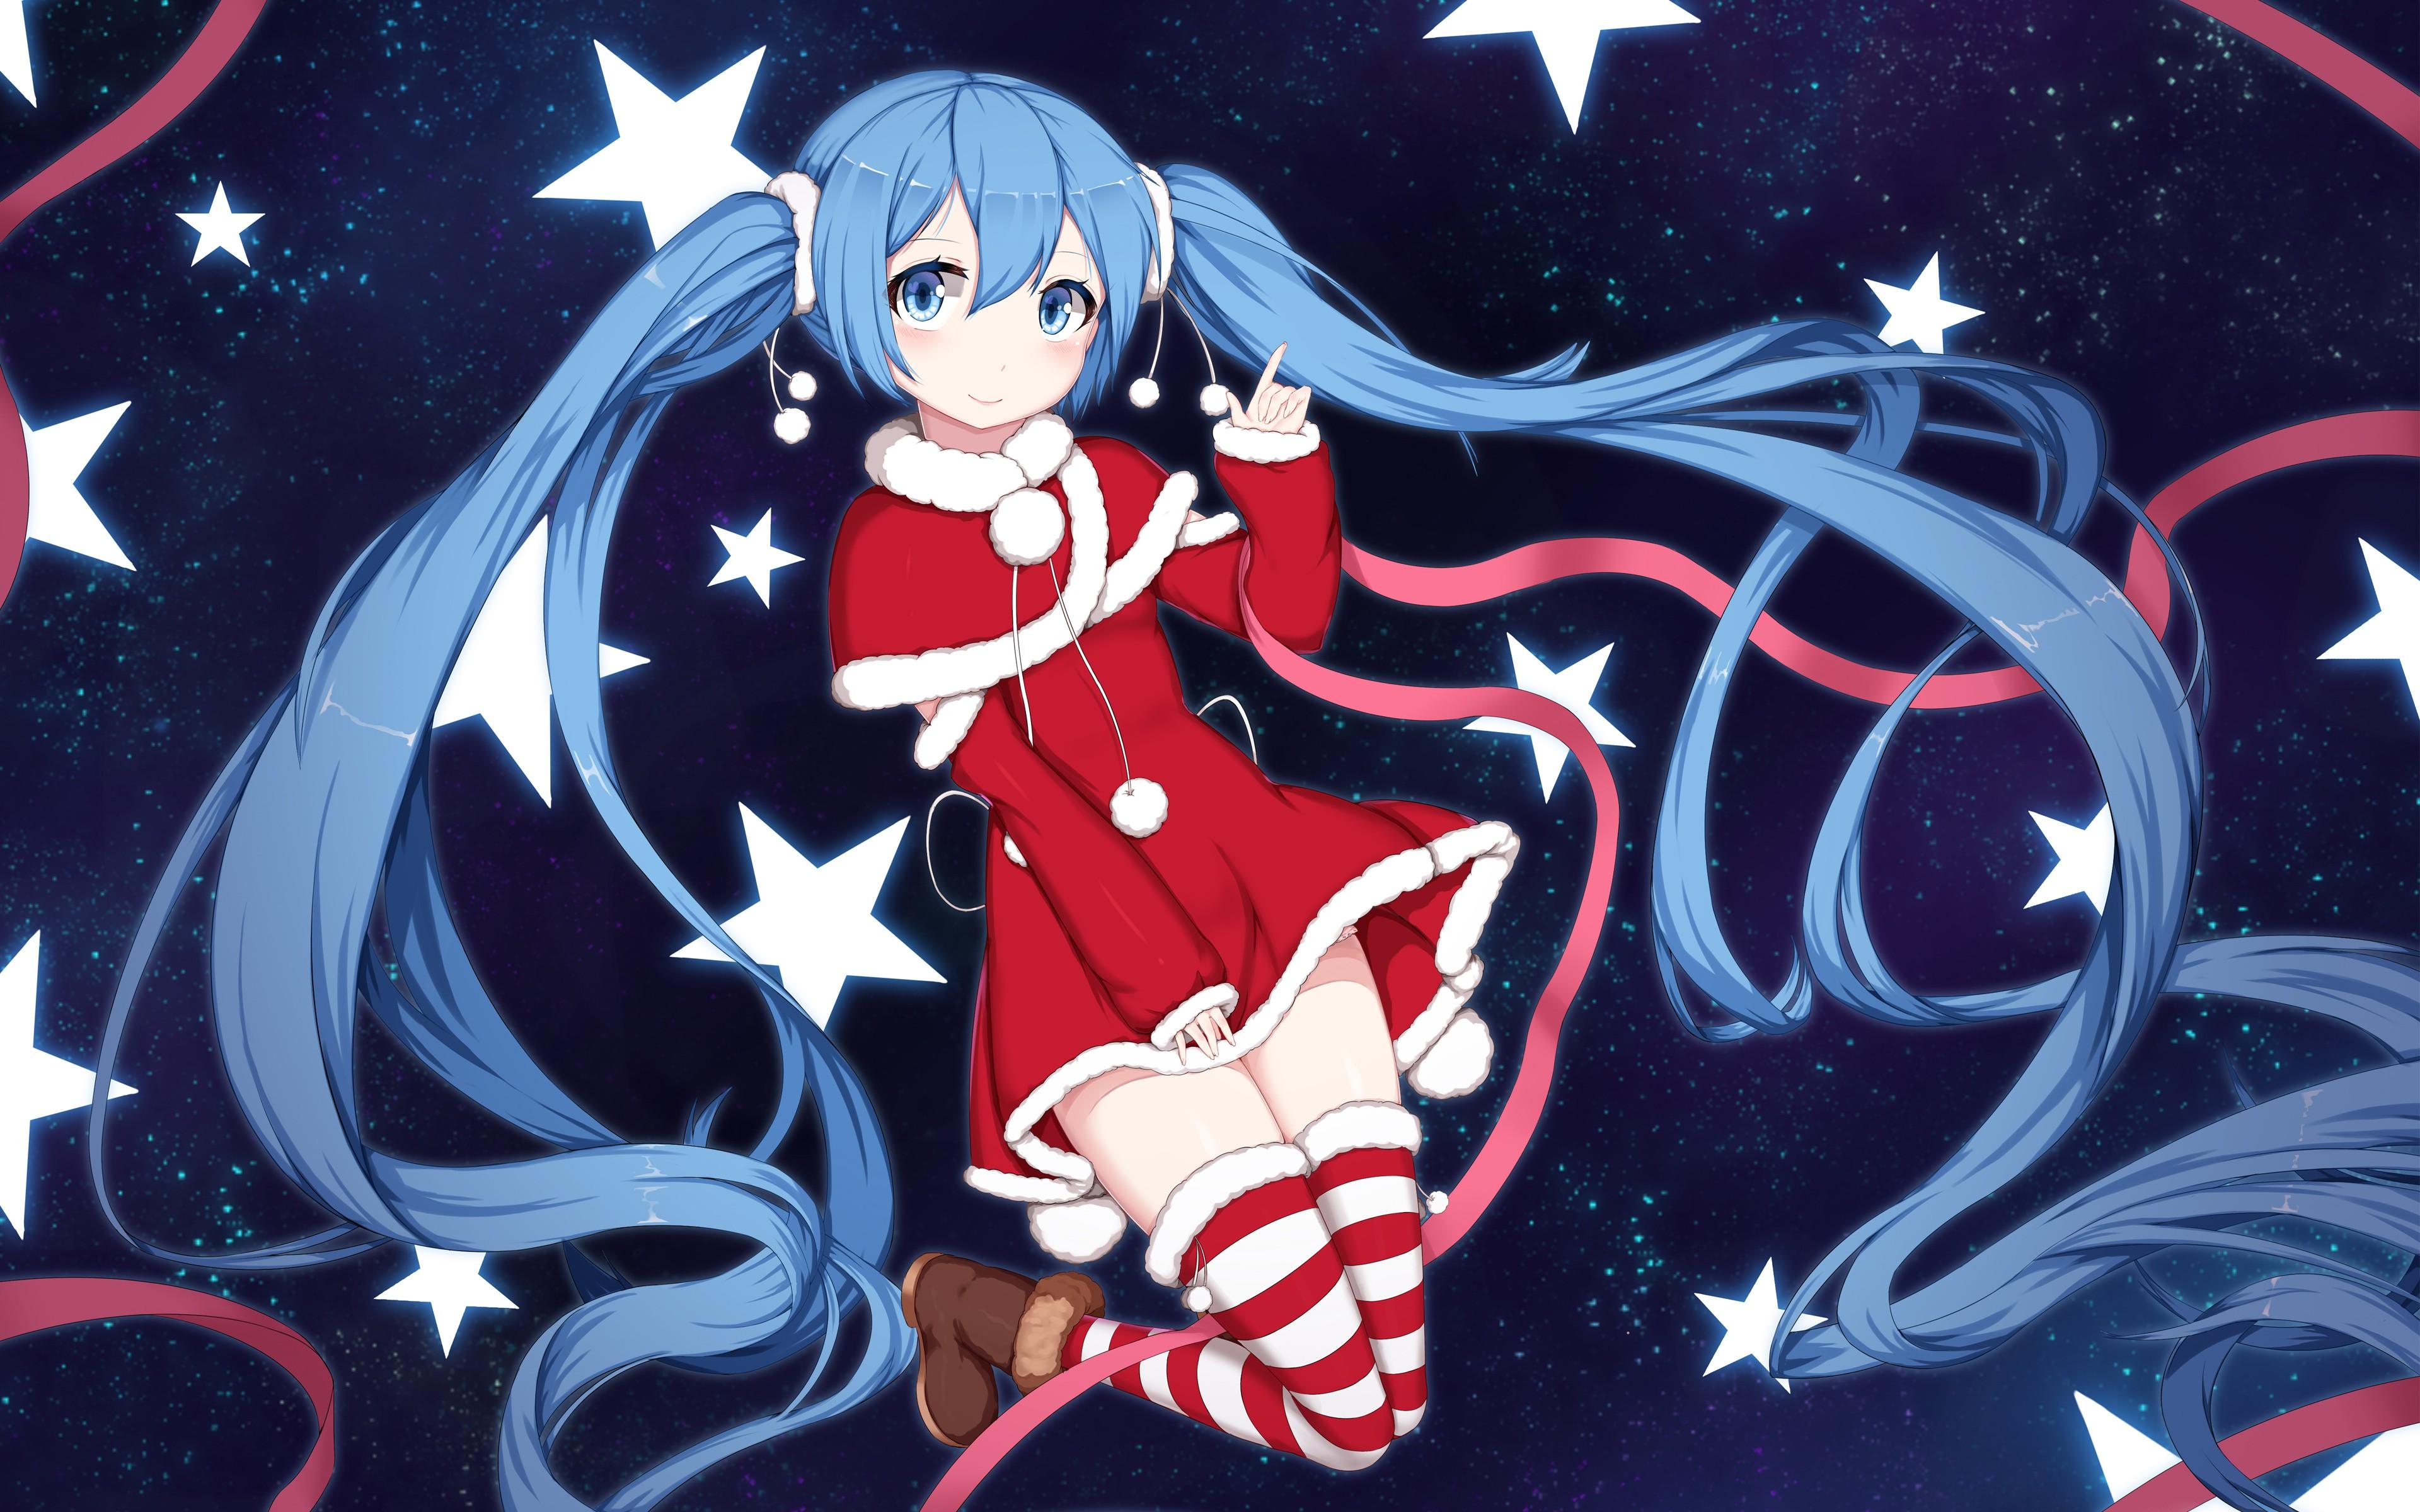 Alone Girl Wallpaper Hd Download Vocaloid Hatsune Miku Santa Wallpapers Hd Wallpapers